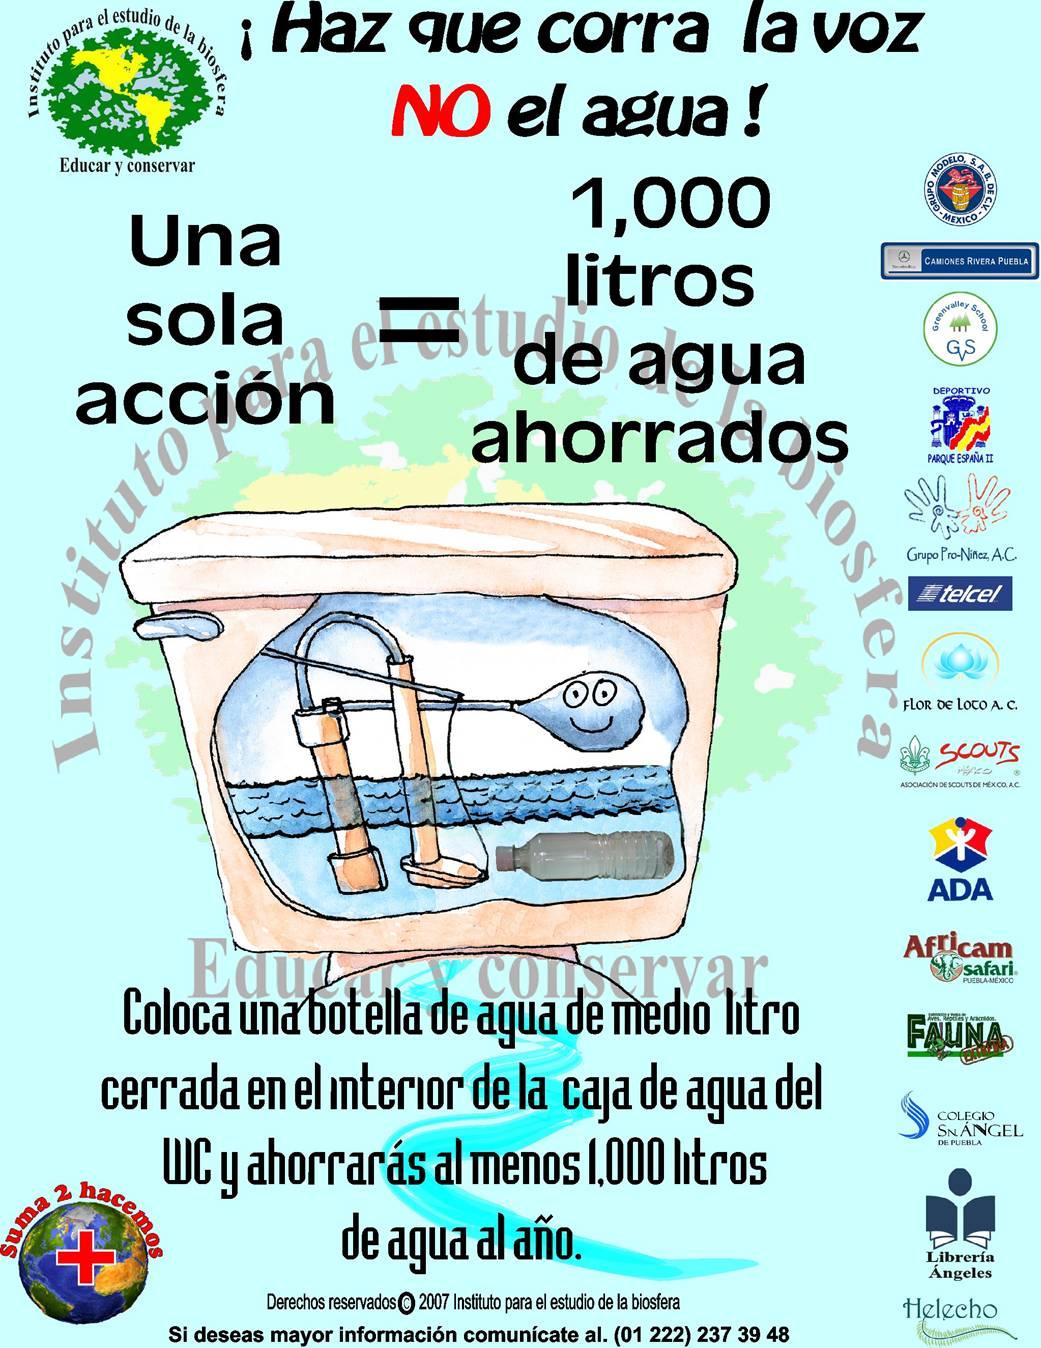 Imagenes de ahorro de agua imagui for Ahorro de agua